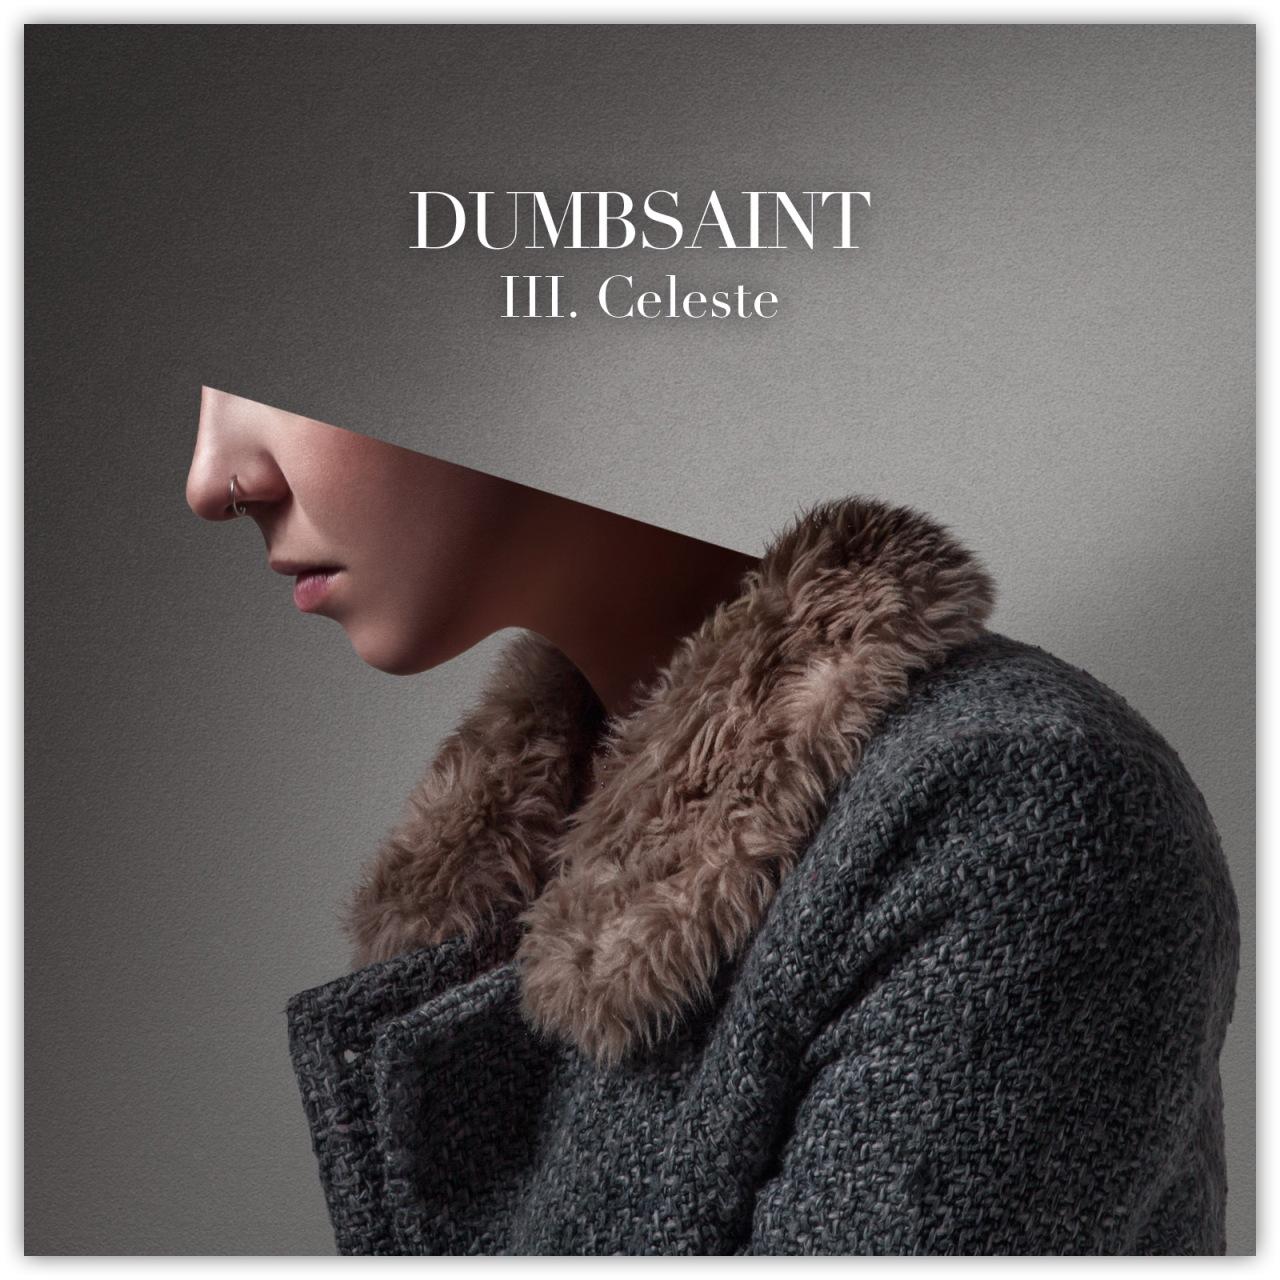 Dumbsaint ~ Disappearance in a Minor Role – Part III:Celeste